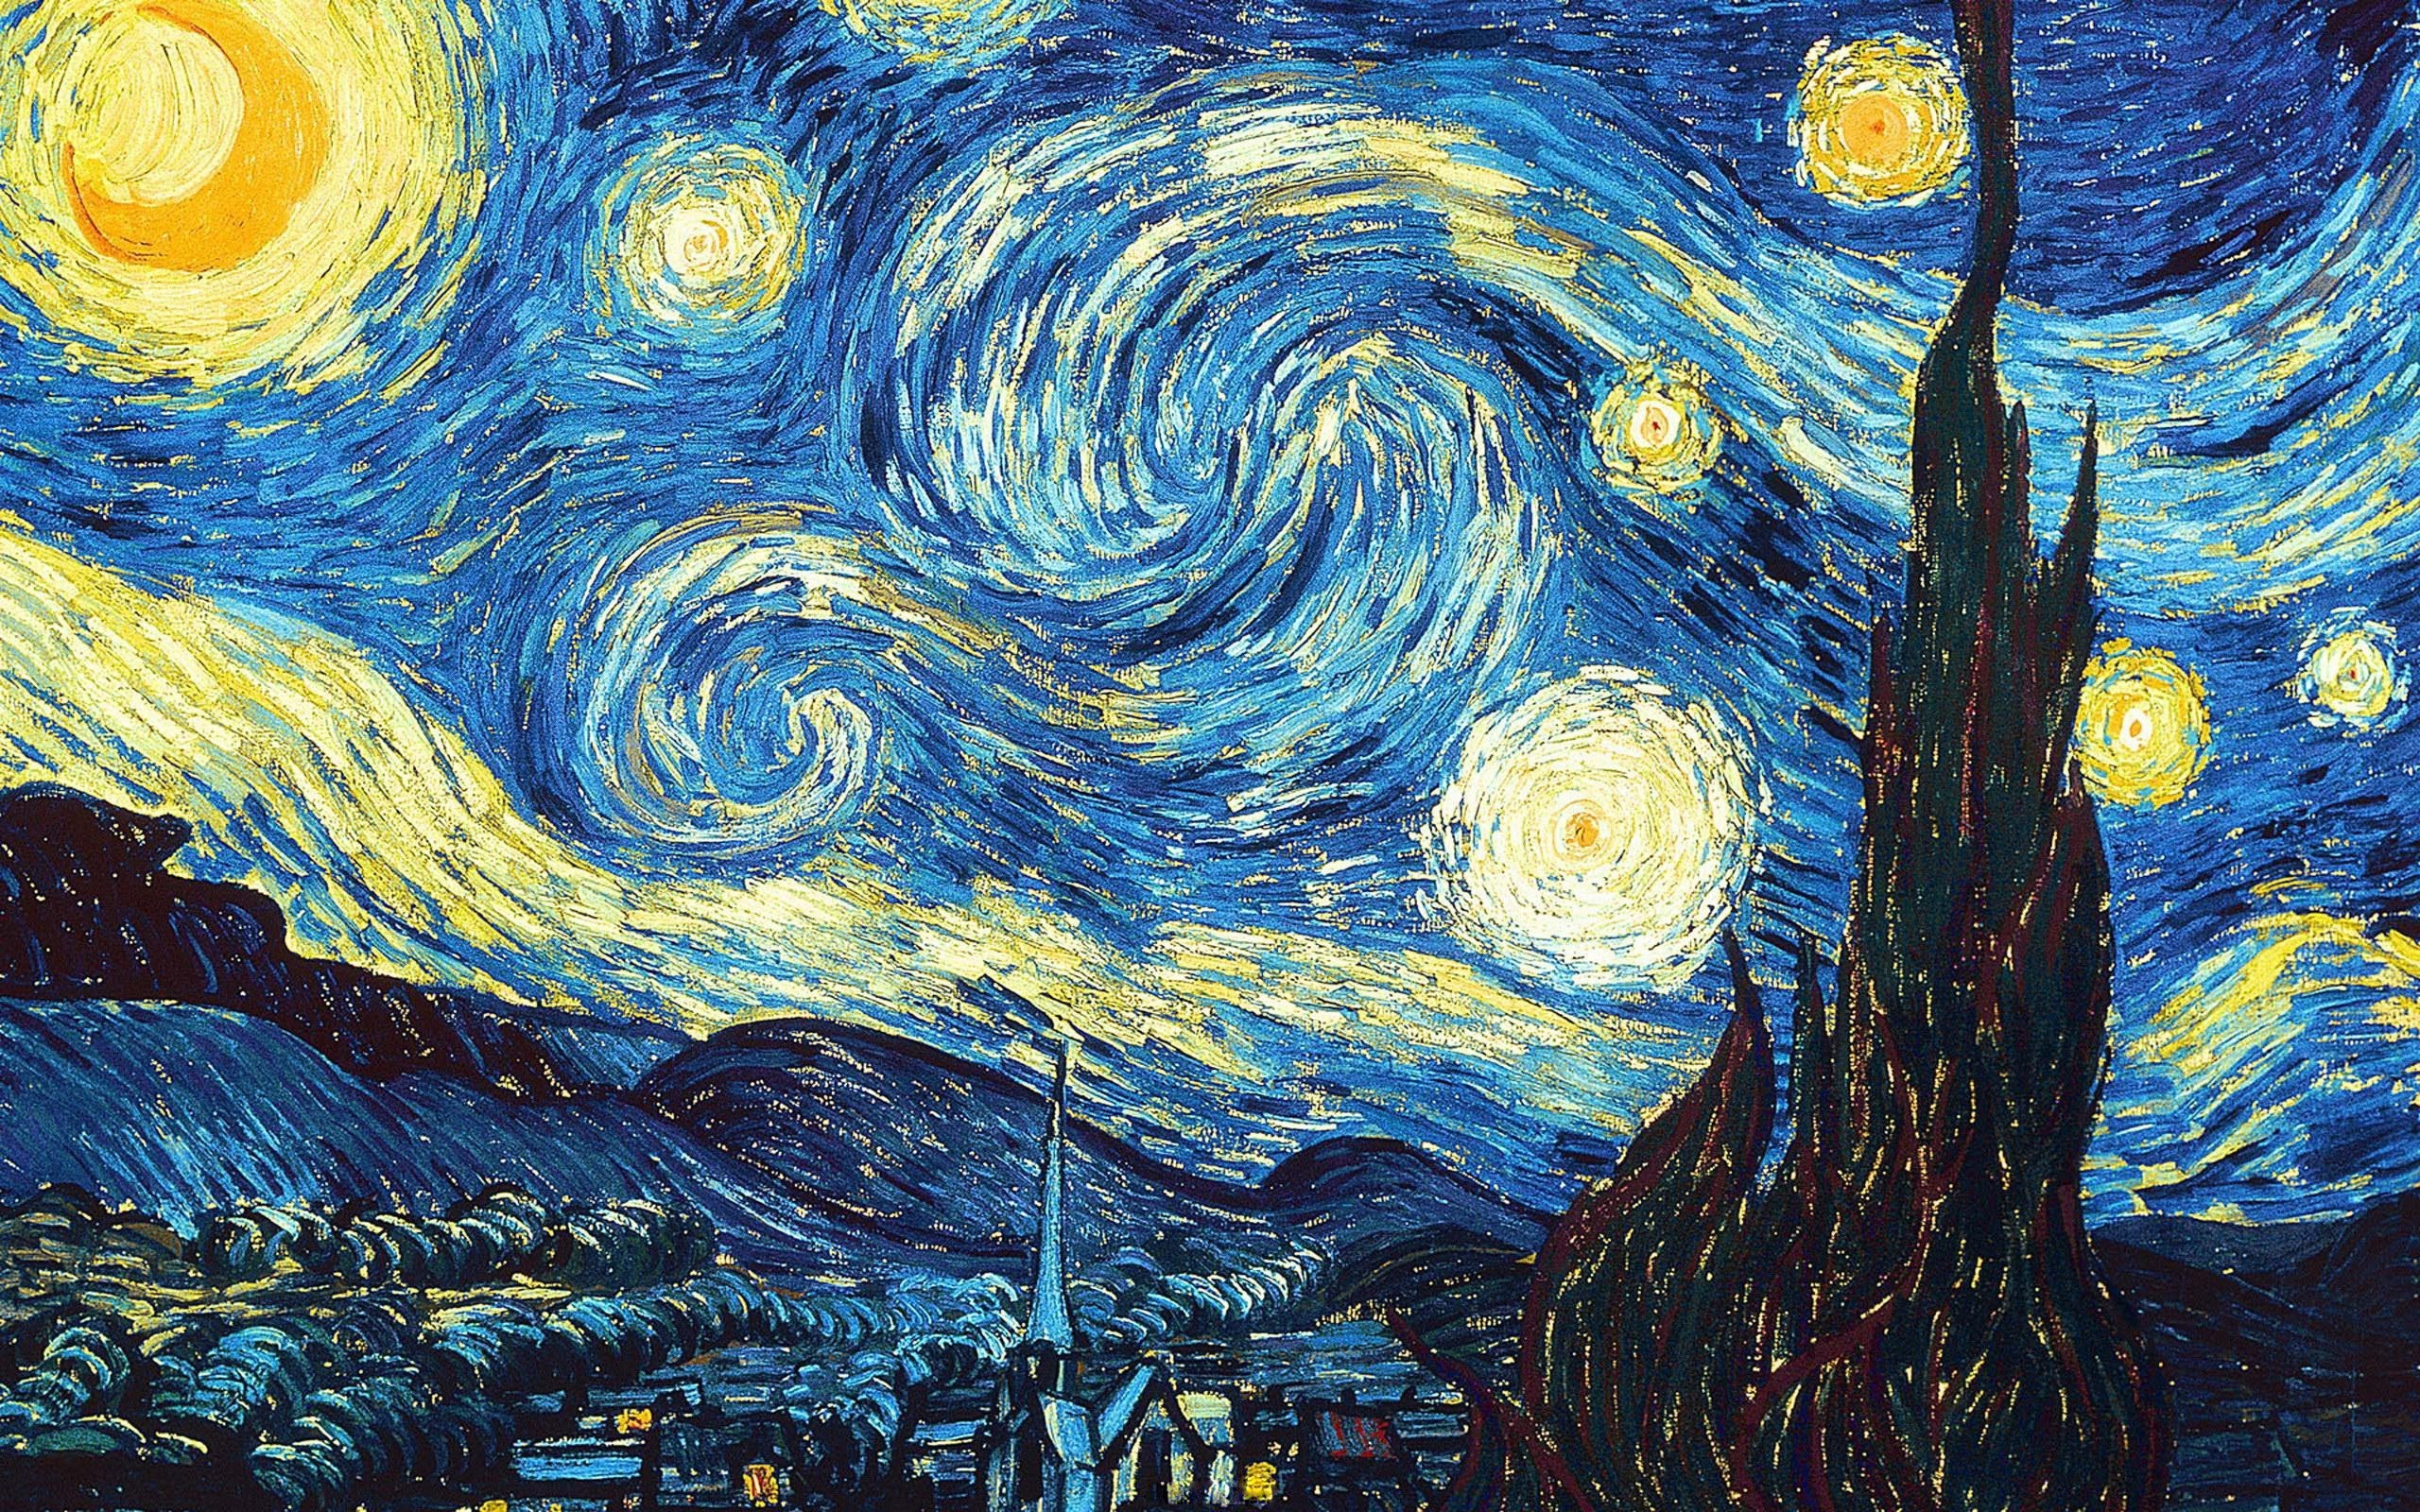 2560x1600 van gogh starry night desktop wallpaper van gogh gallery